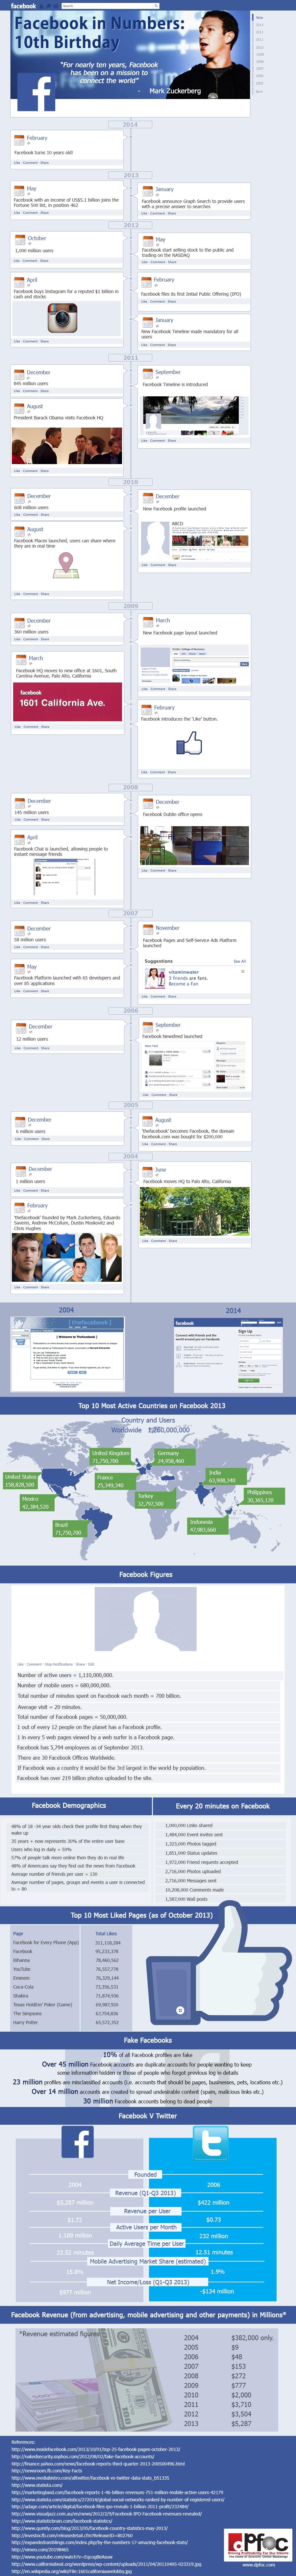 facebook infographic 2014